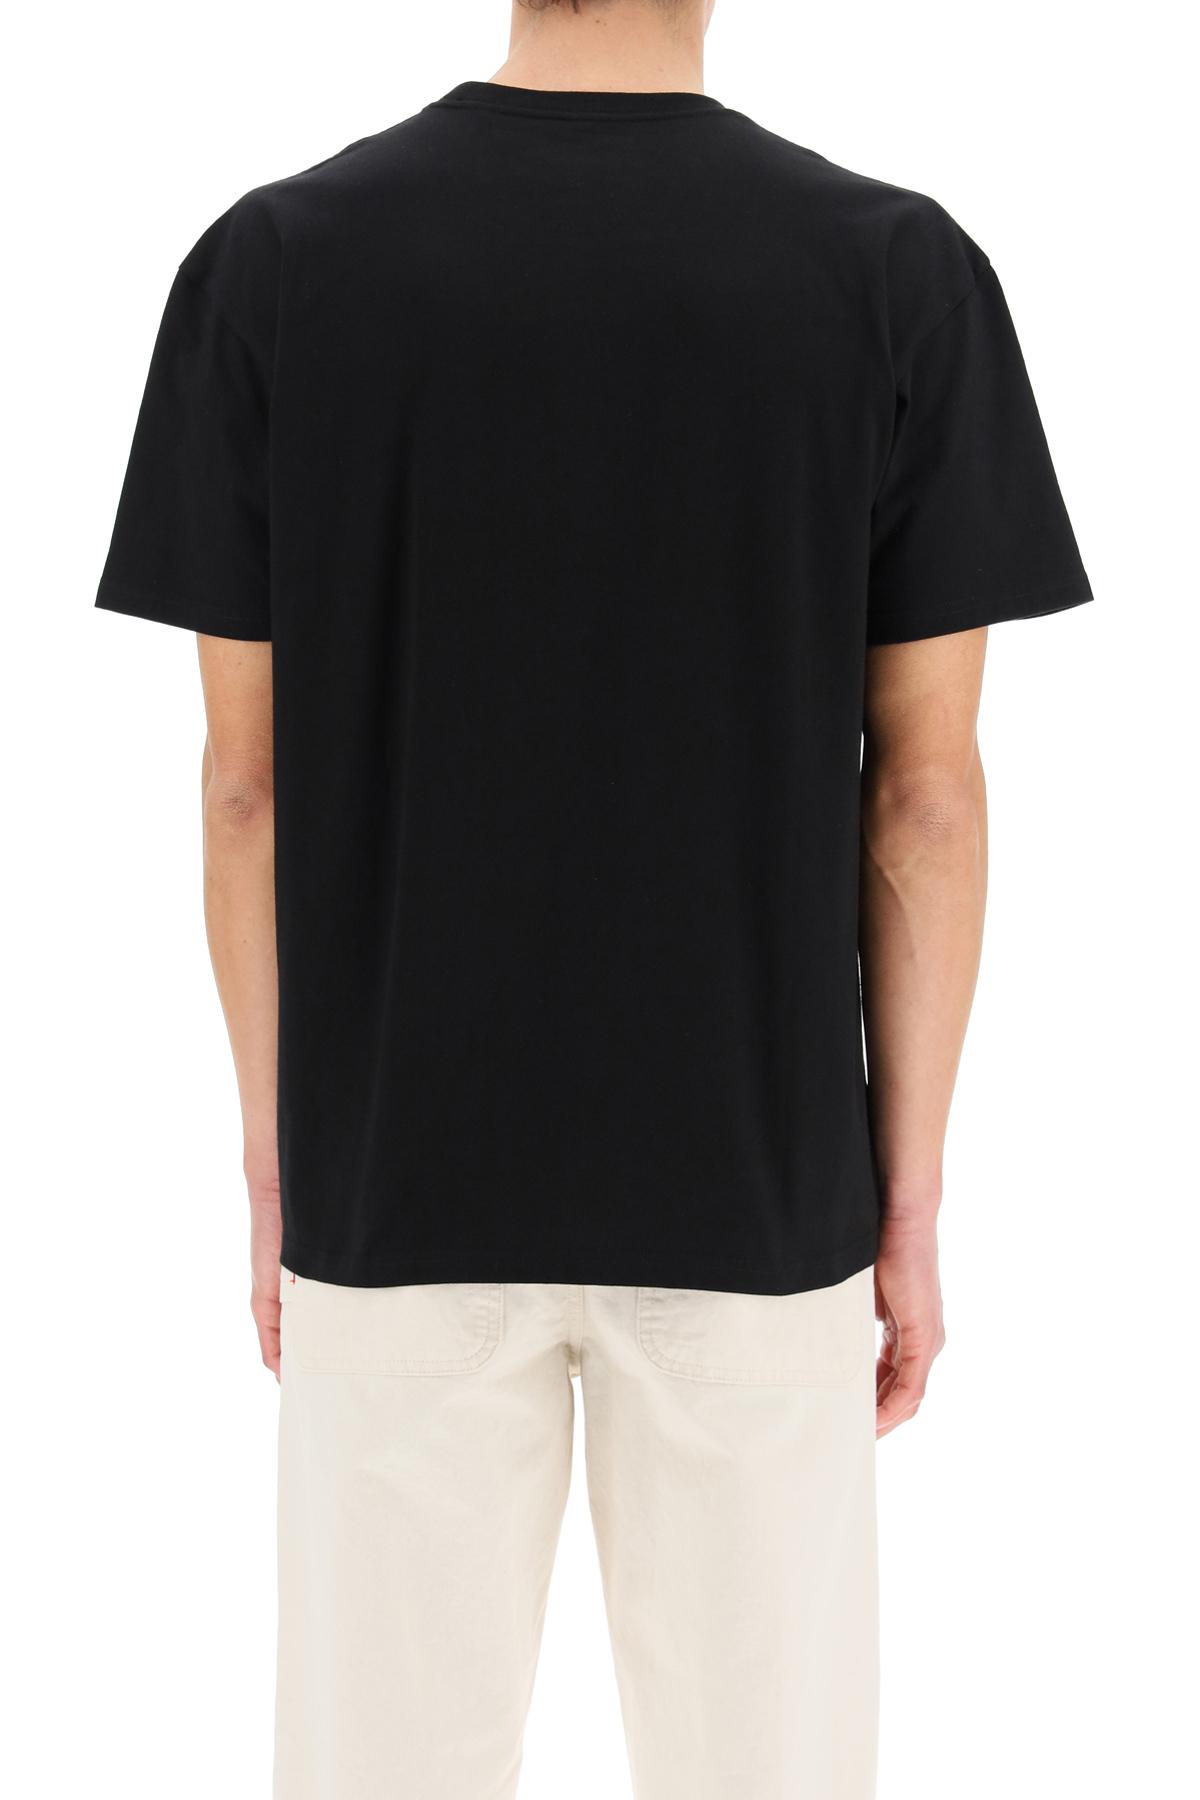 Carhartt t-shirt s/s chase con ricamo logo